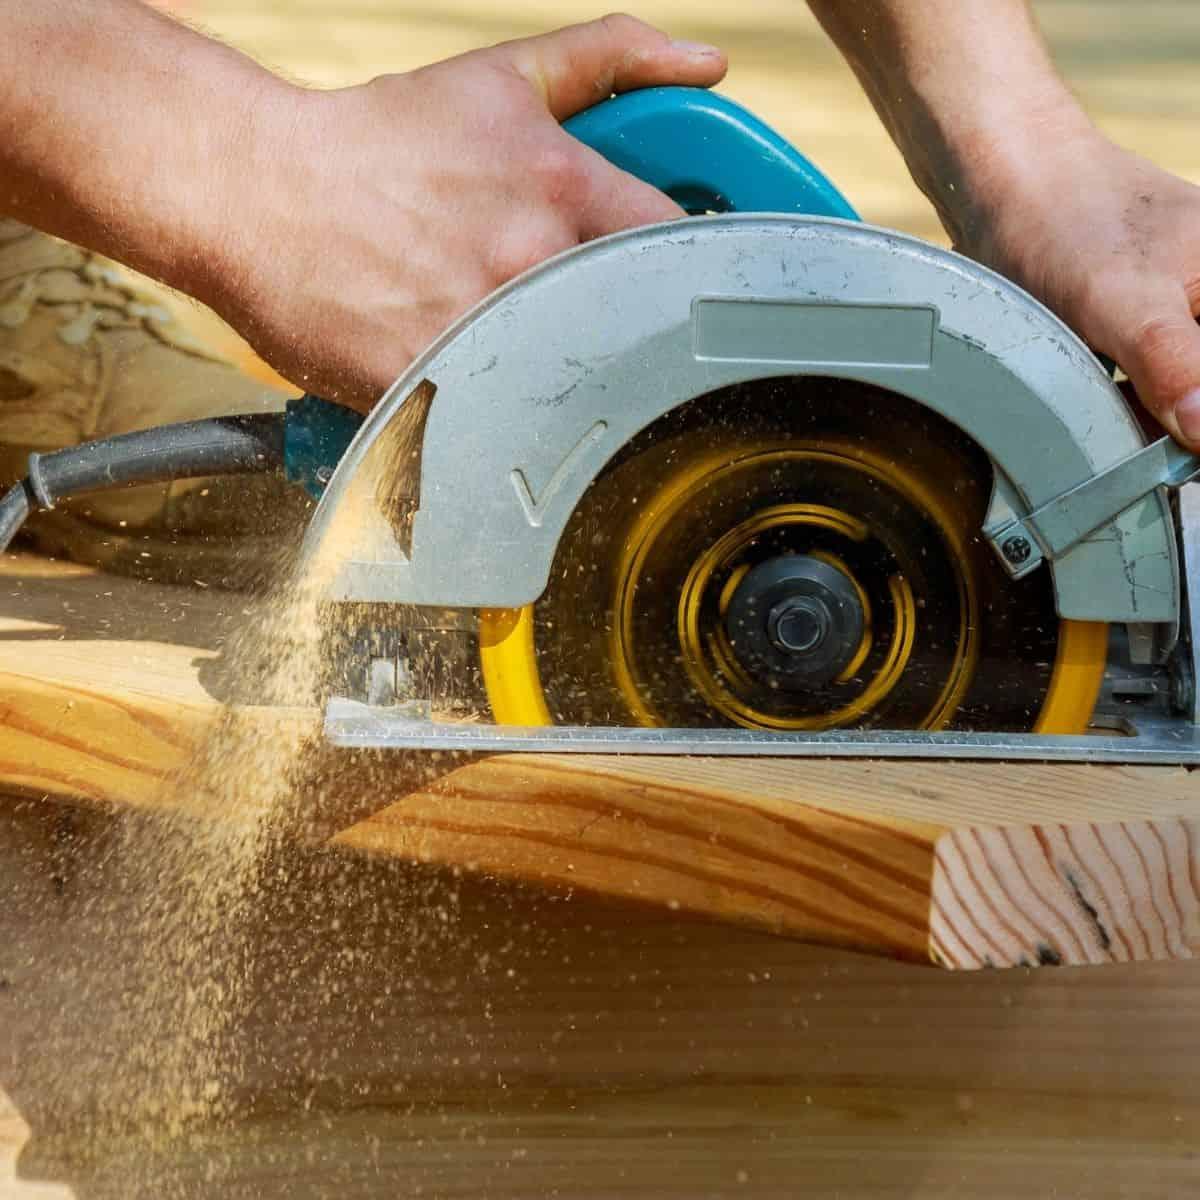 circular saw cutting lumber quickly